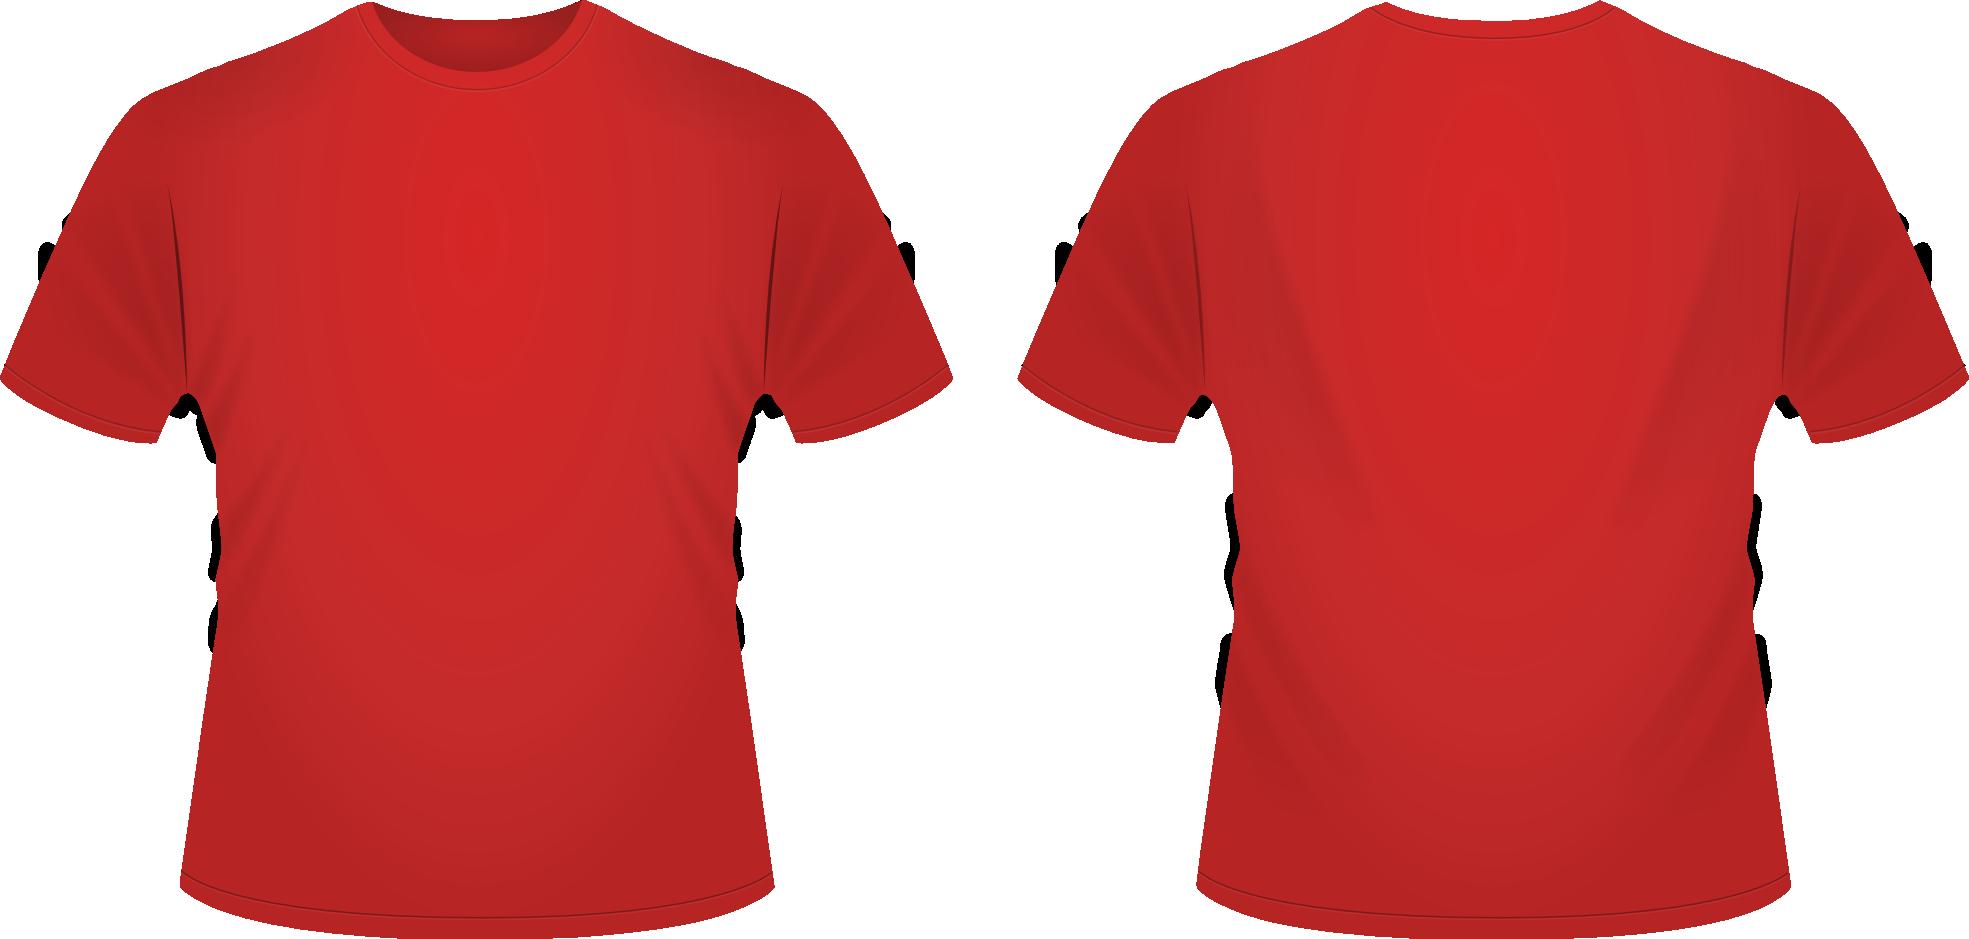 Blank t shirt png joy studio design gallery best design for Start an online t shirt business at zero cost